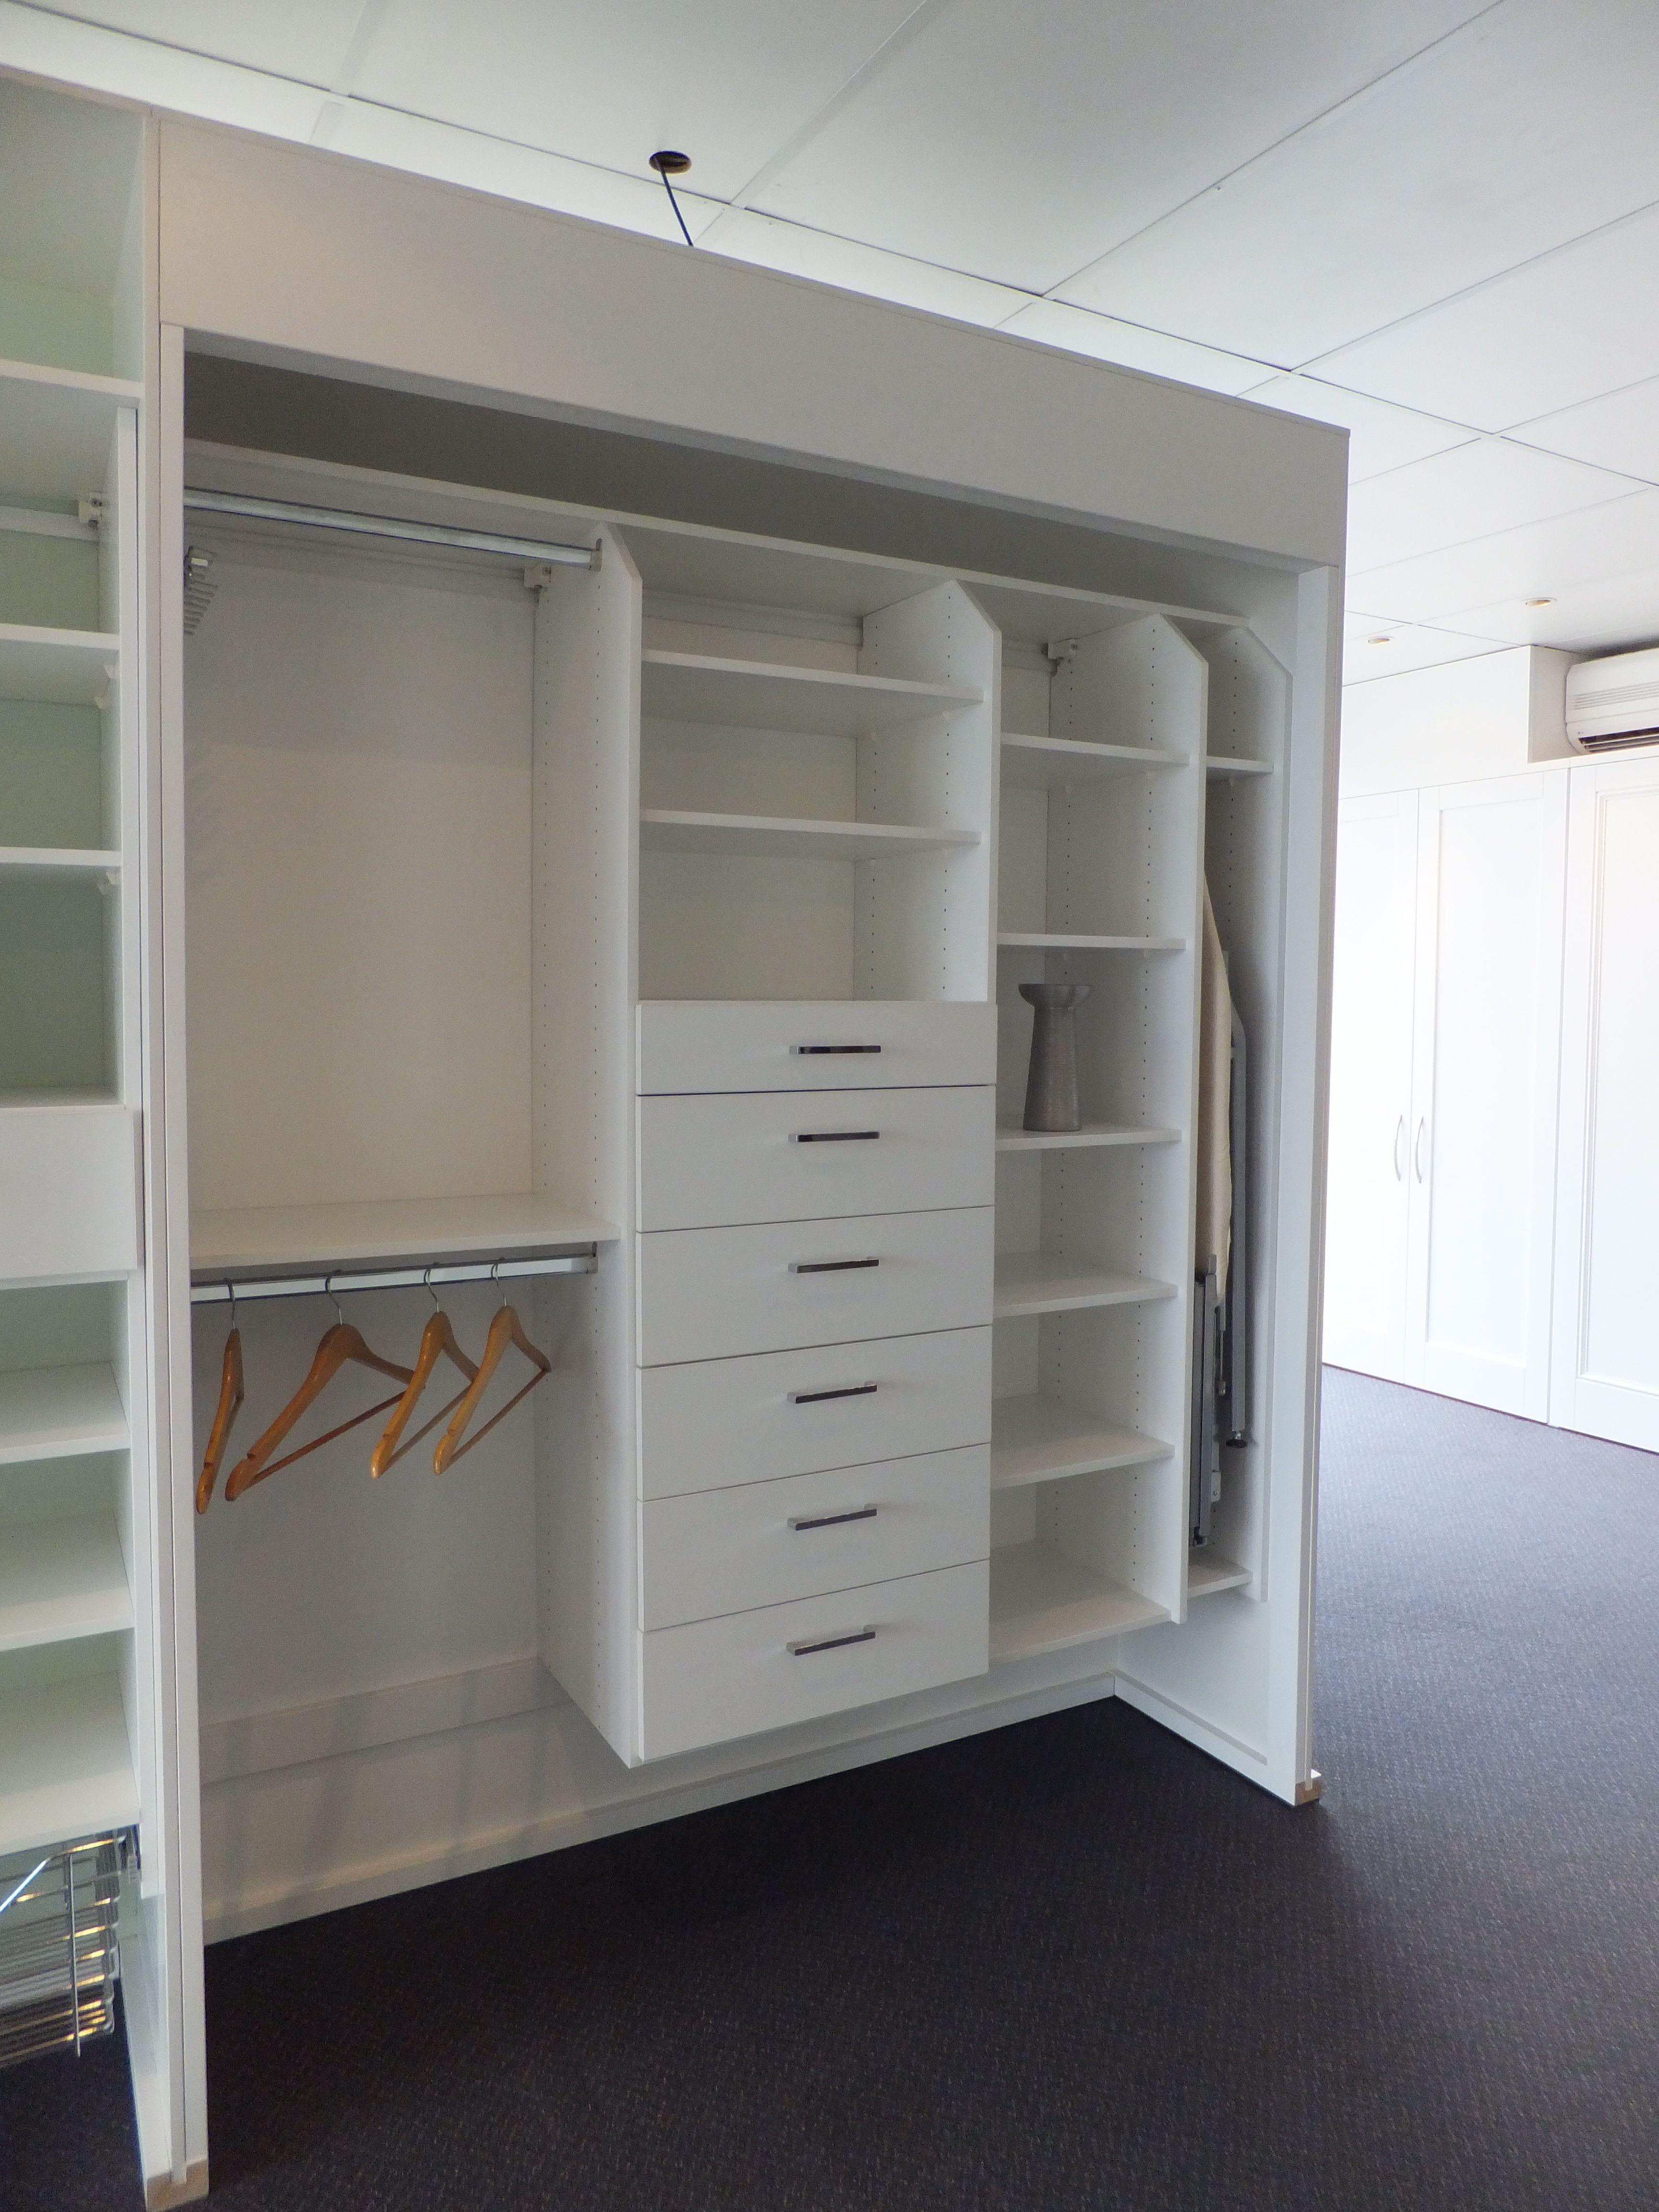 Bespoke wardrobe design